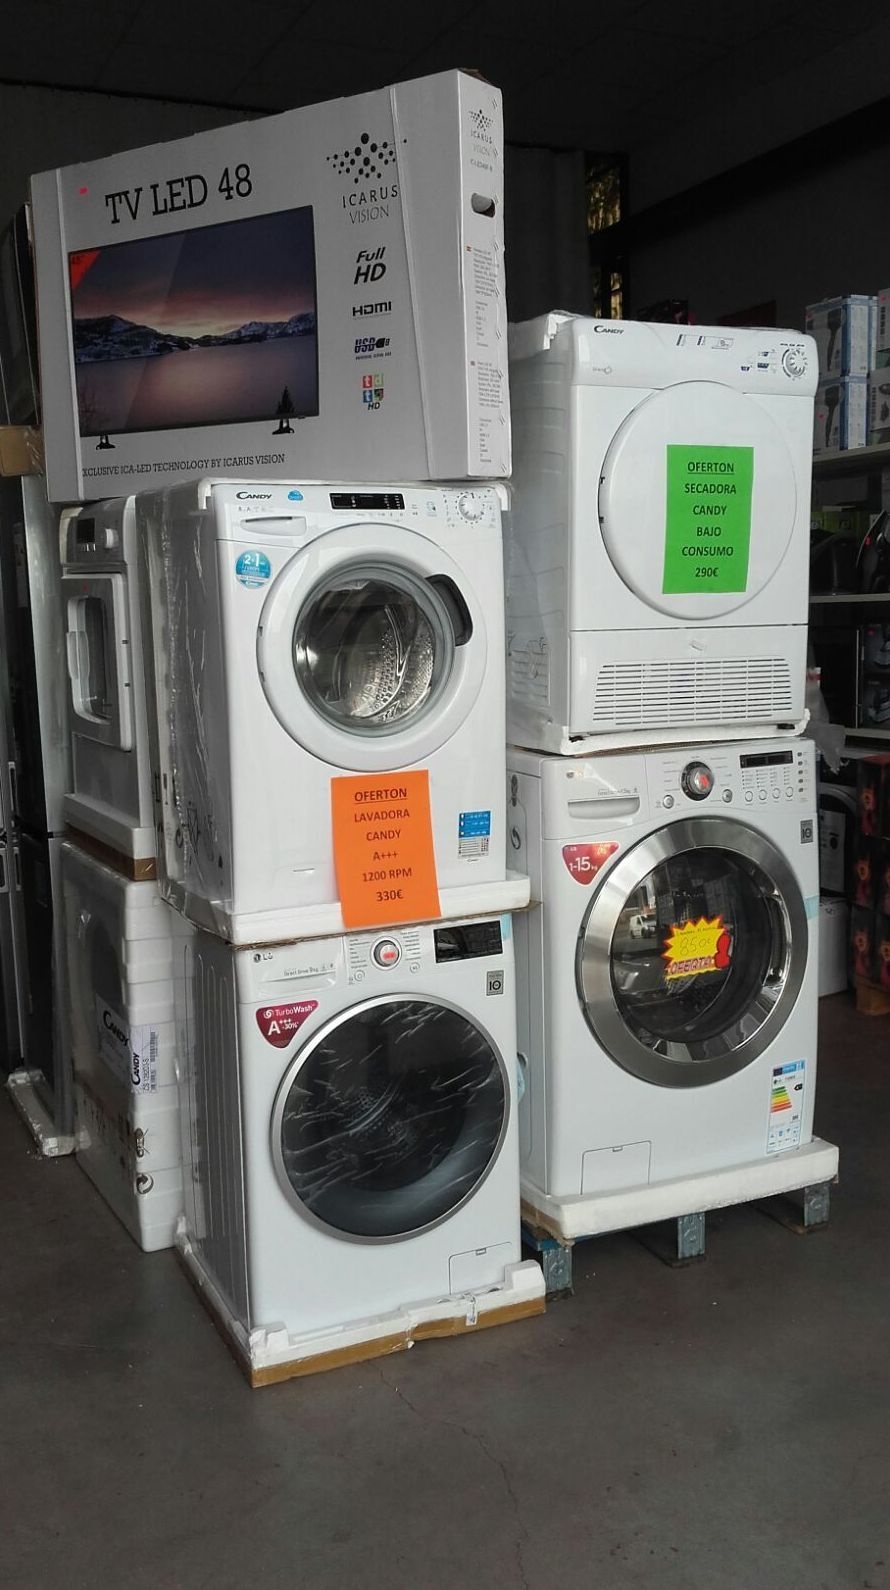 Oferta de lavadoras en Electrobox